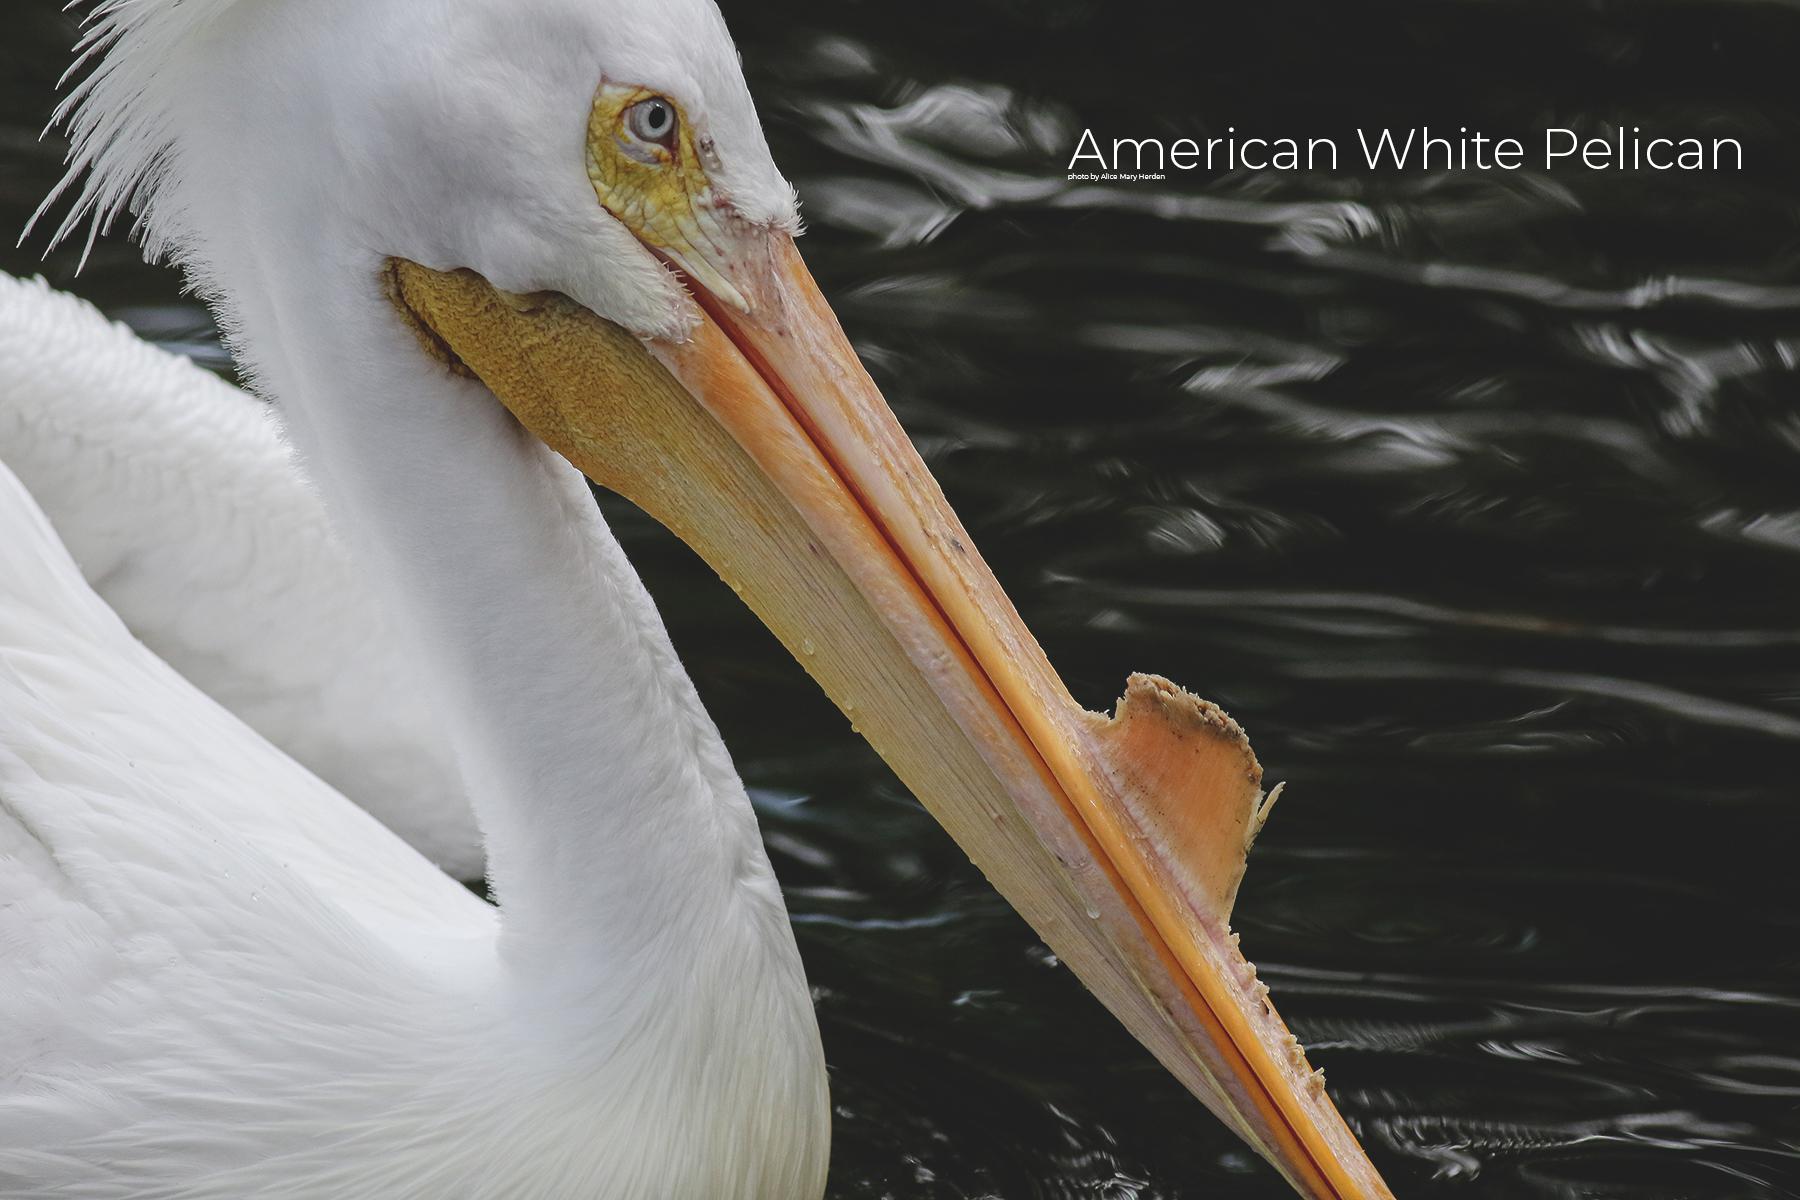 AMH_3044Wild Seabirds- The American White Pelican